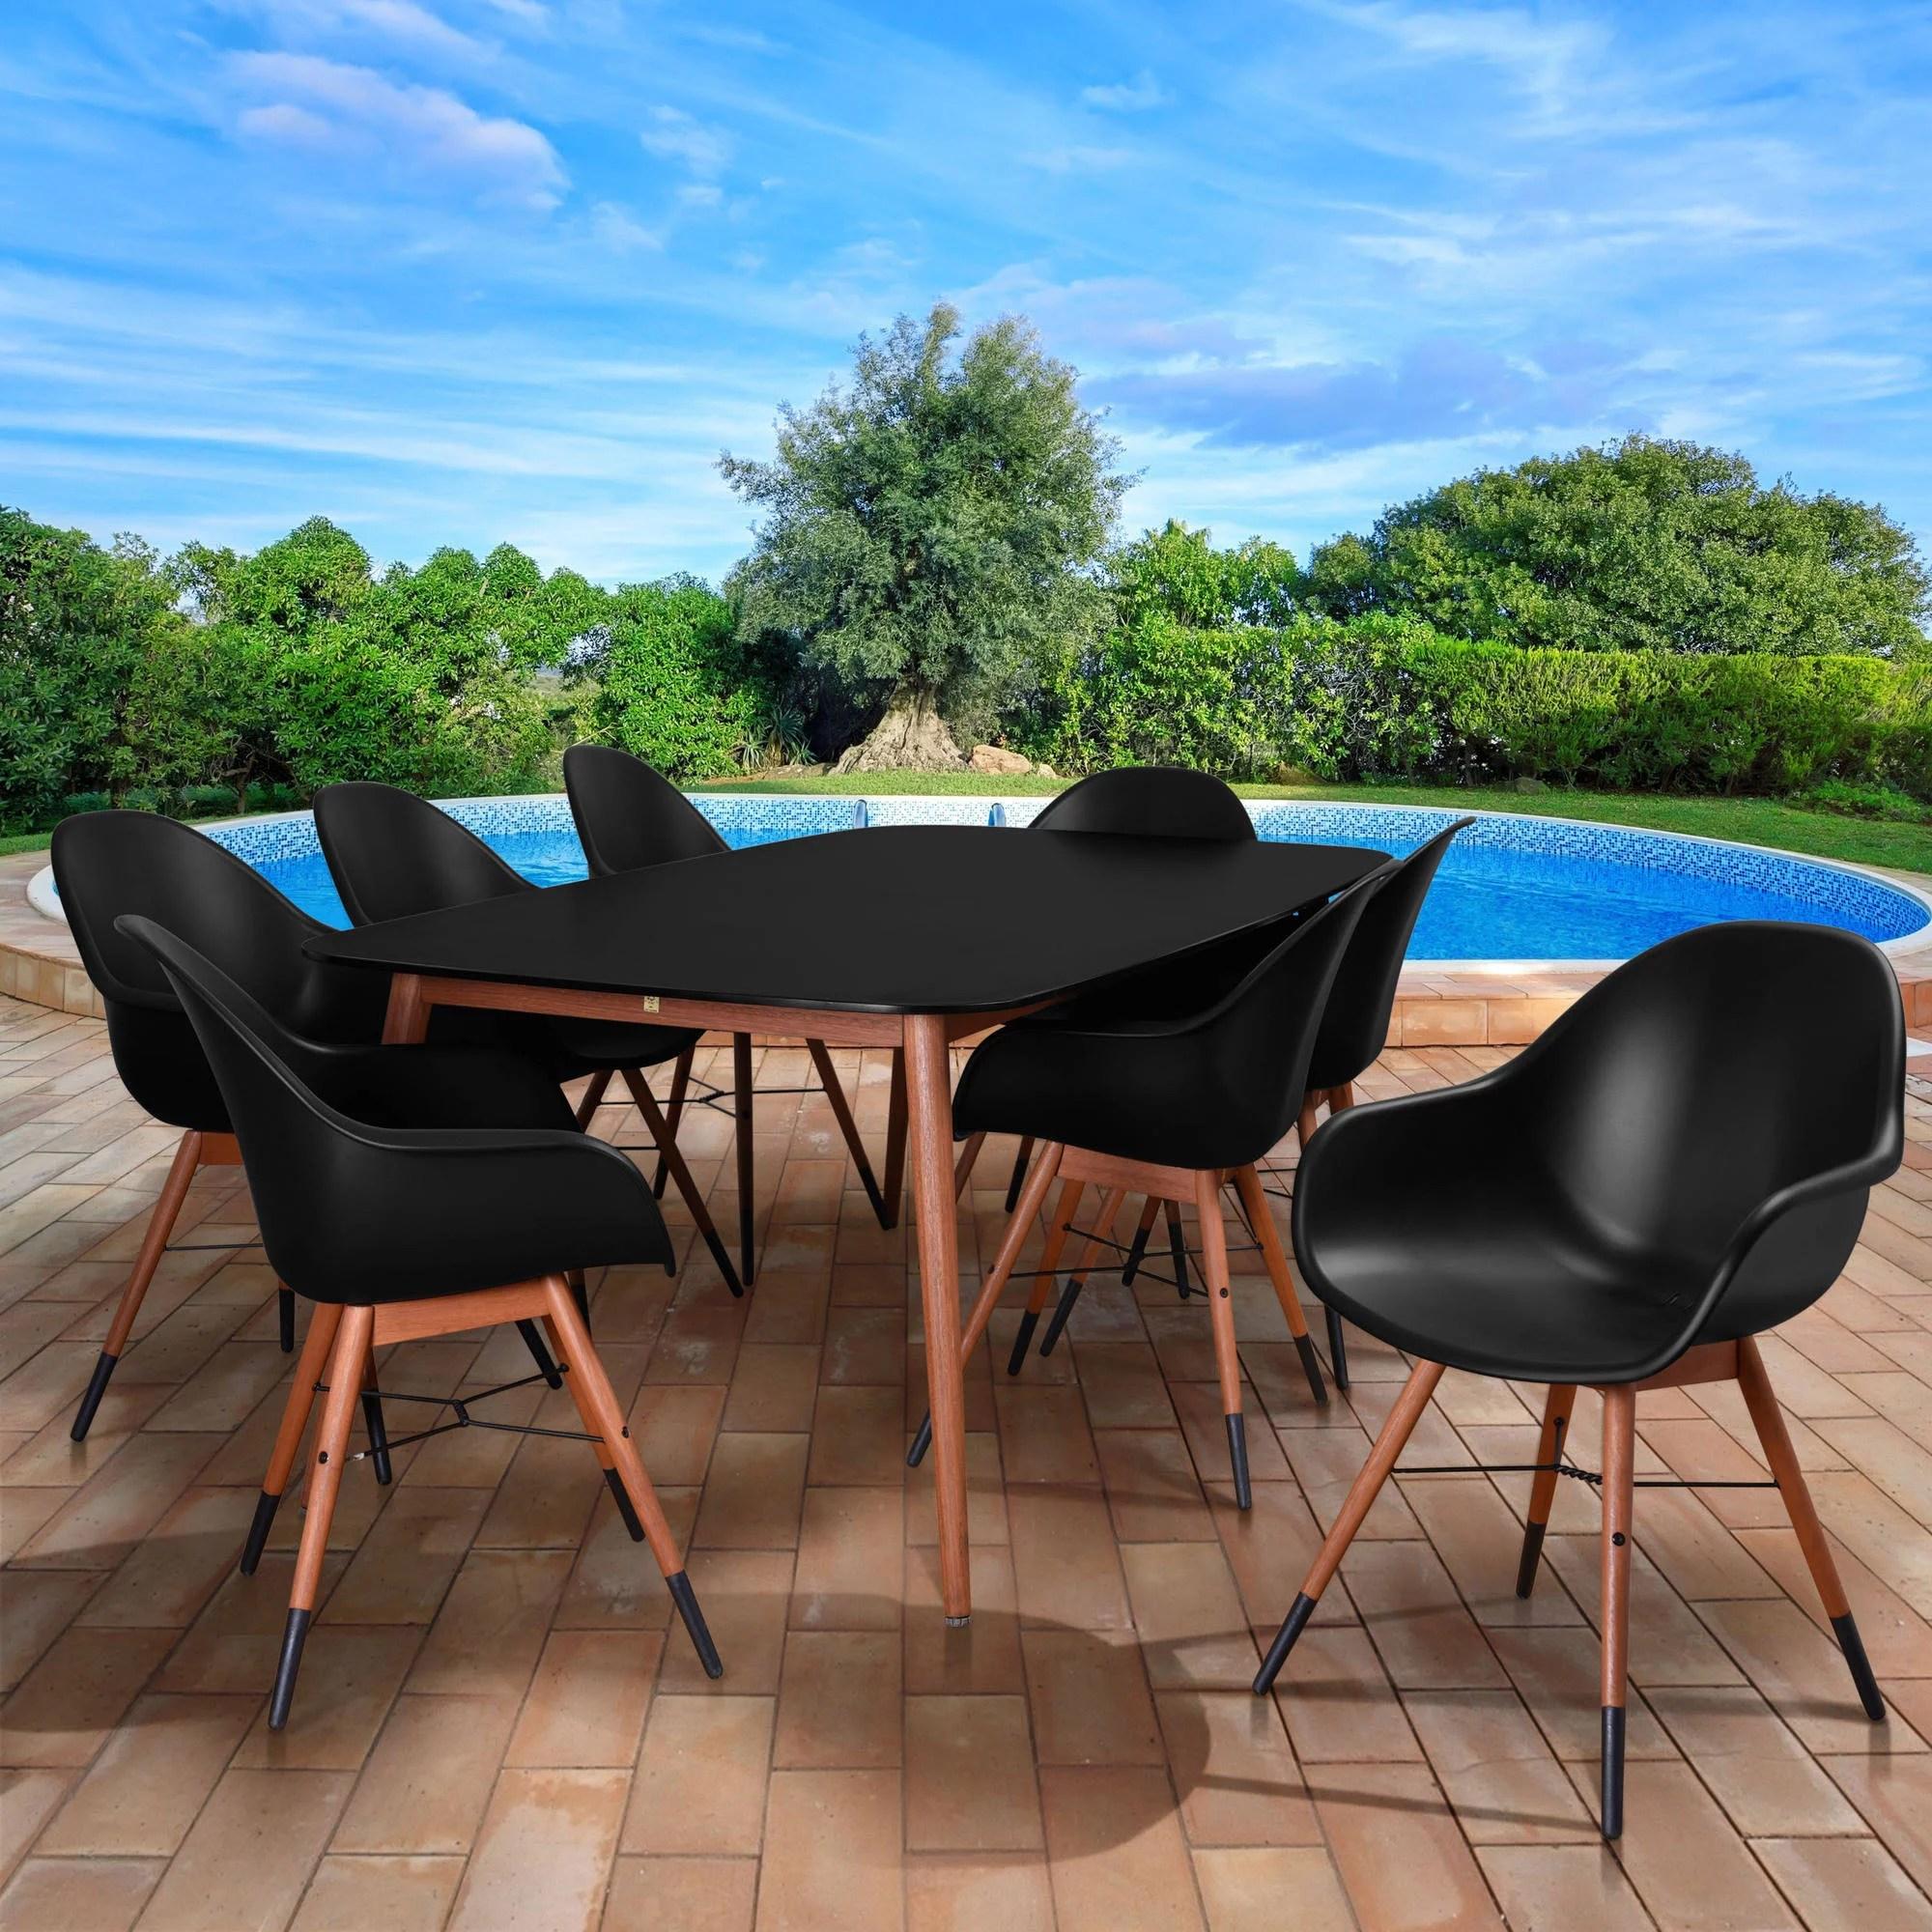 amazonia eucalyptus chamonix 9 piece dining set black seating capacity 8 walmart com